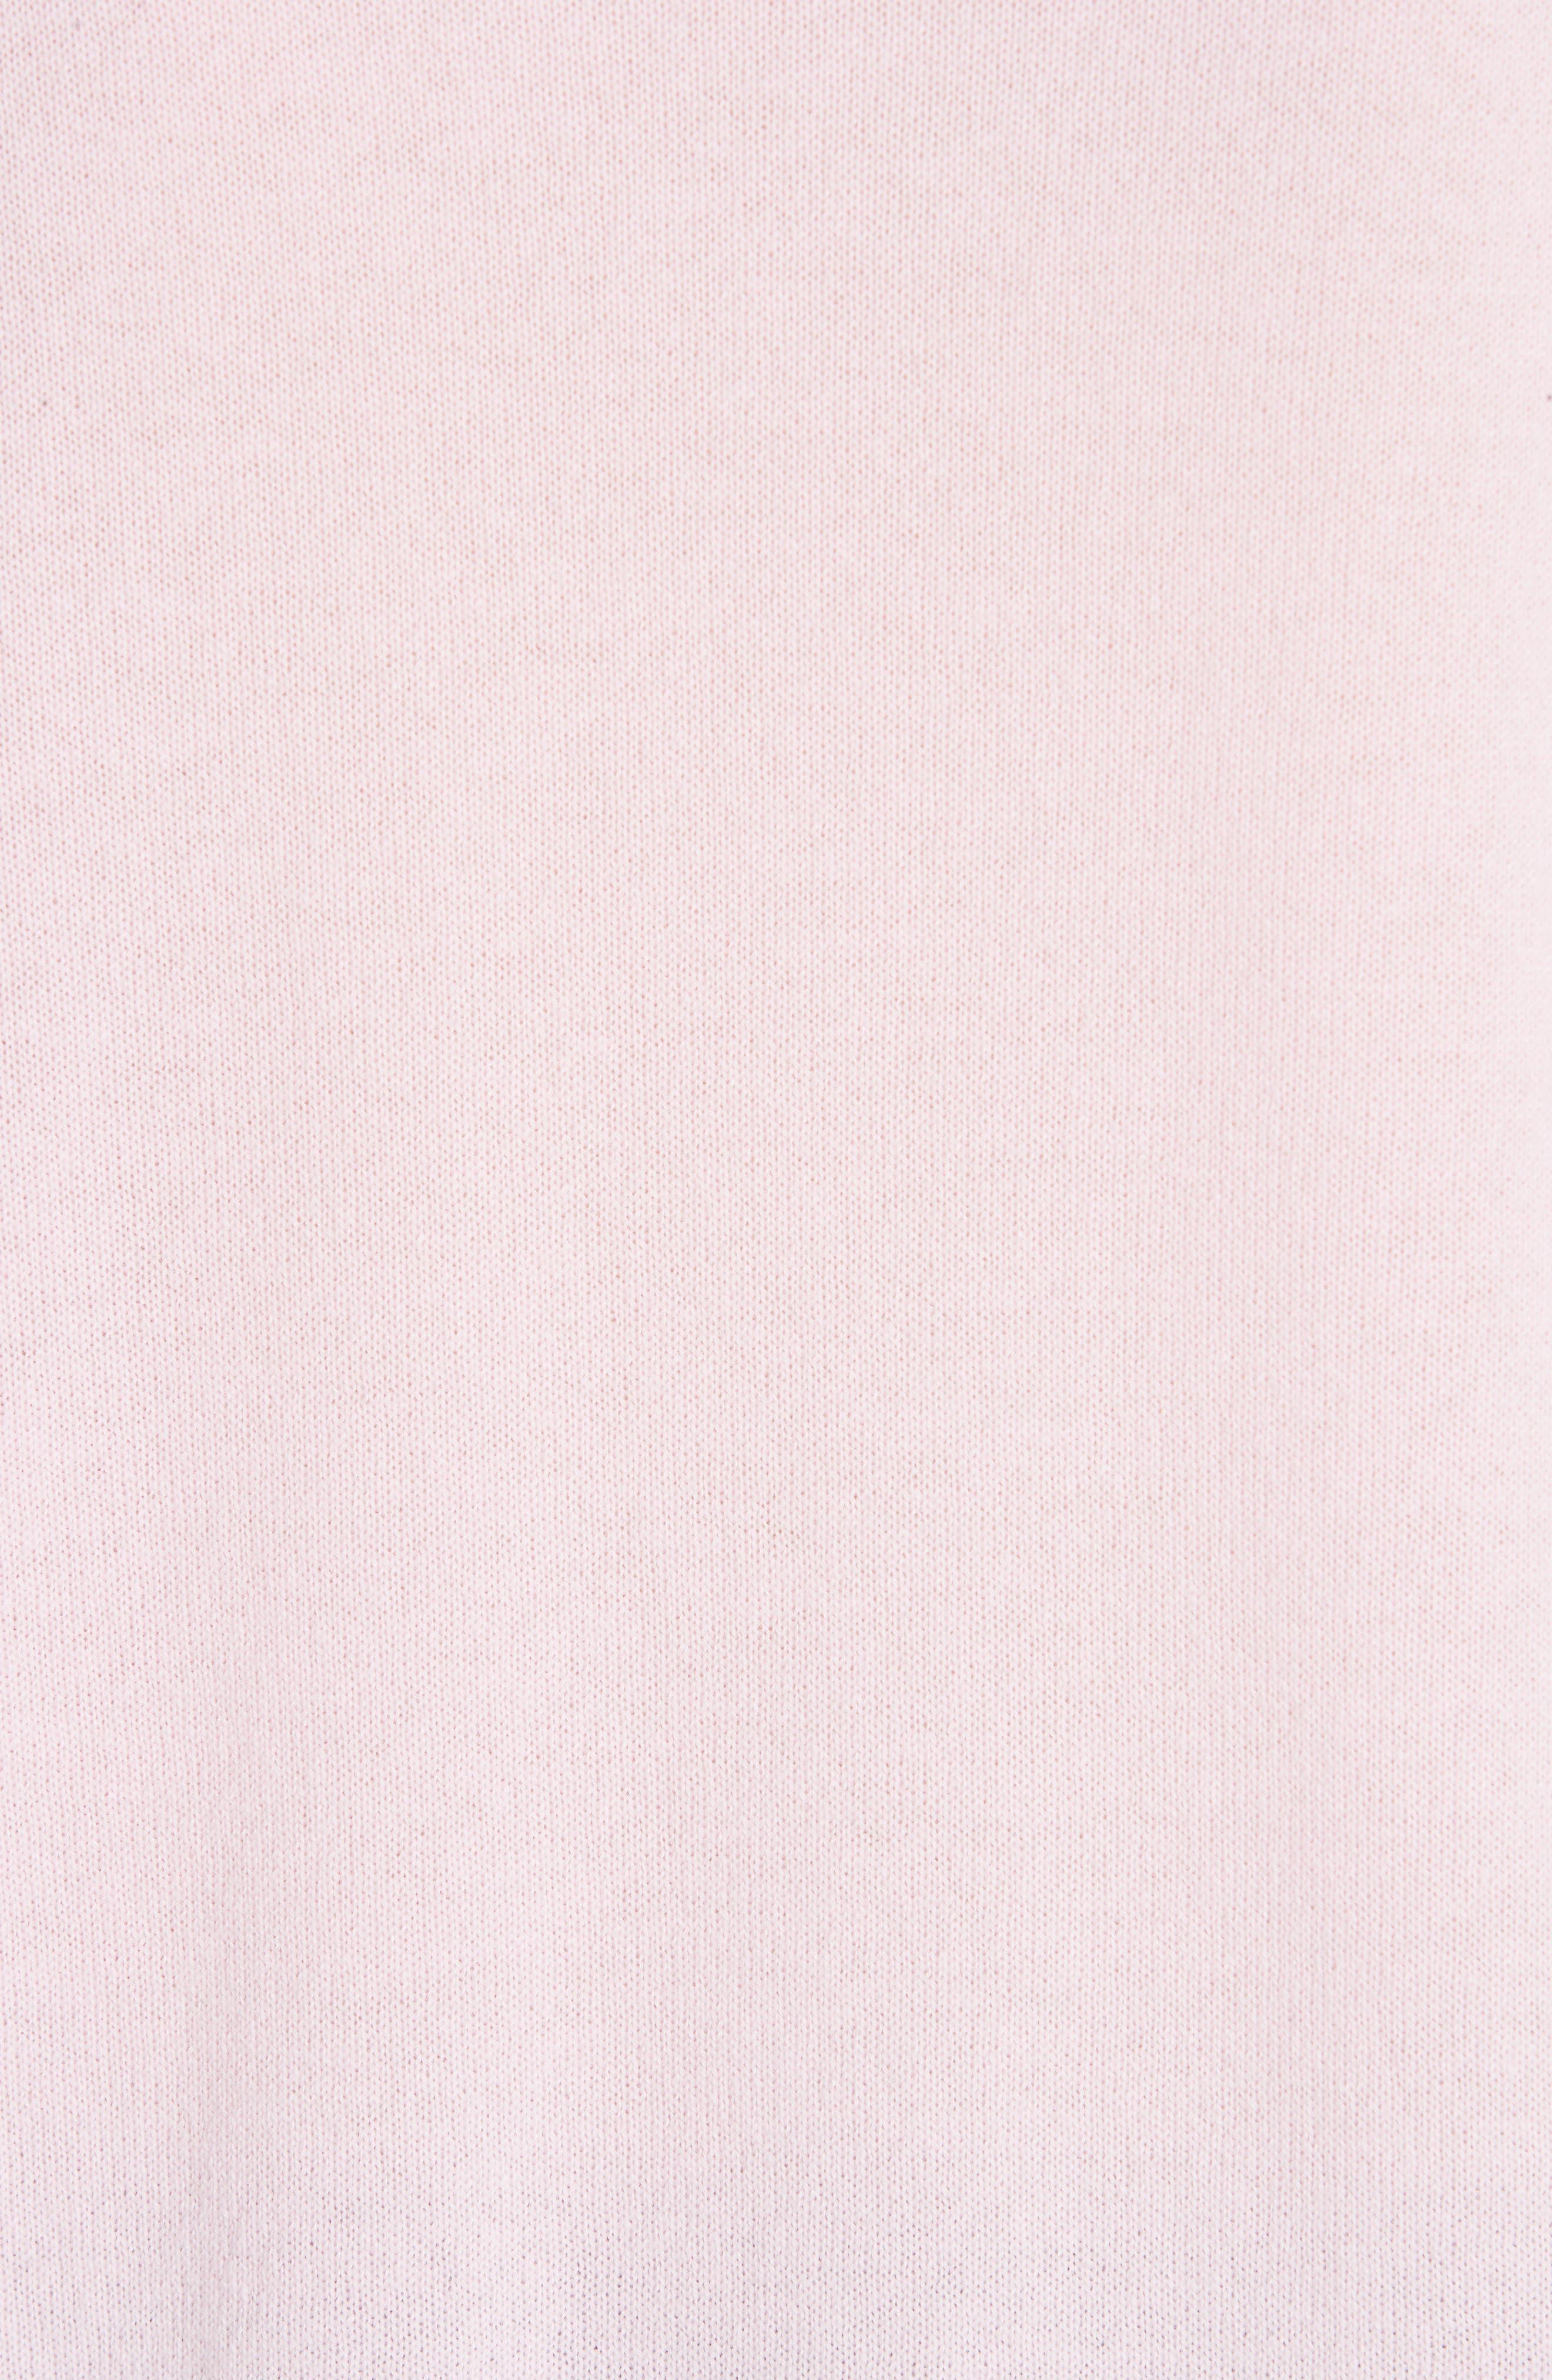 Metallic Trim Cashmere Sweater,                             Alternate thumbnail 5, color,                             PINK